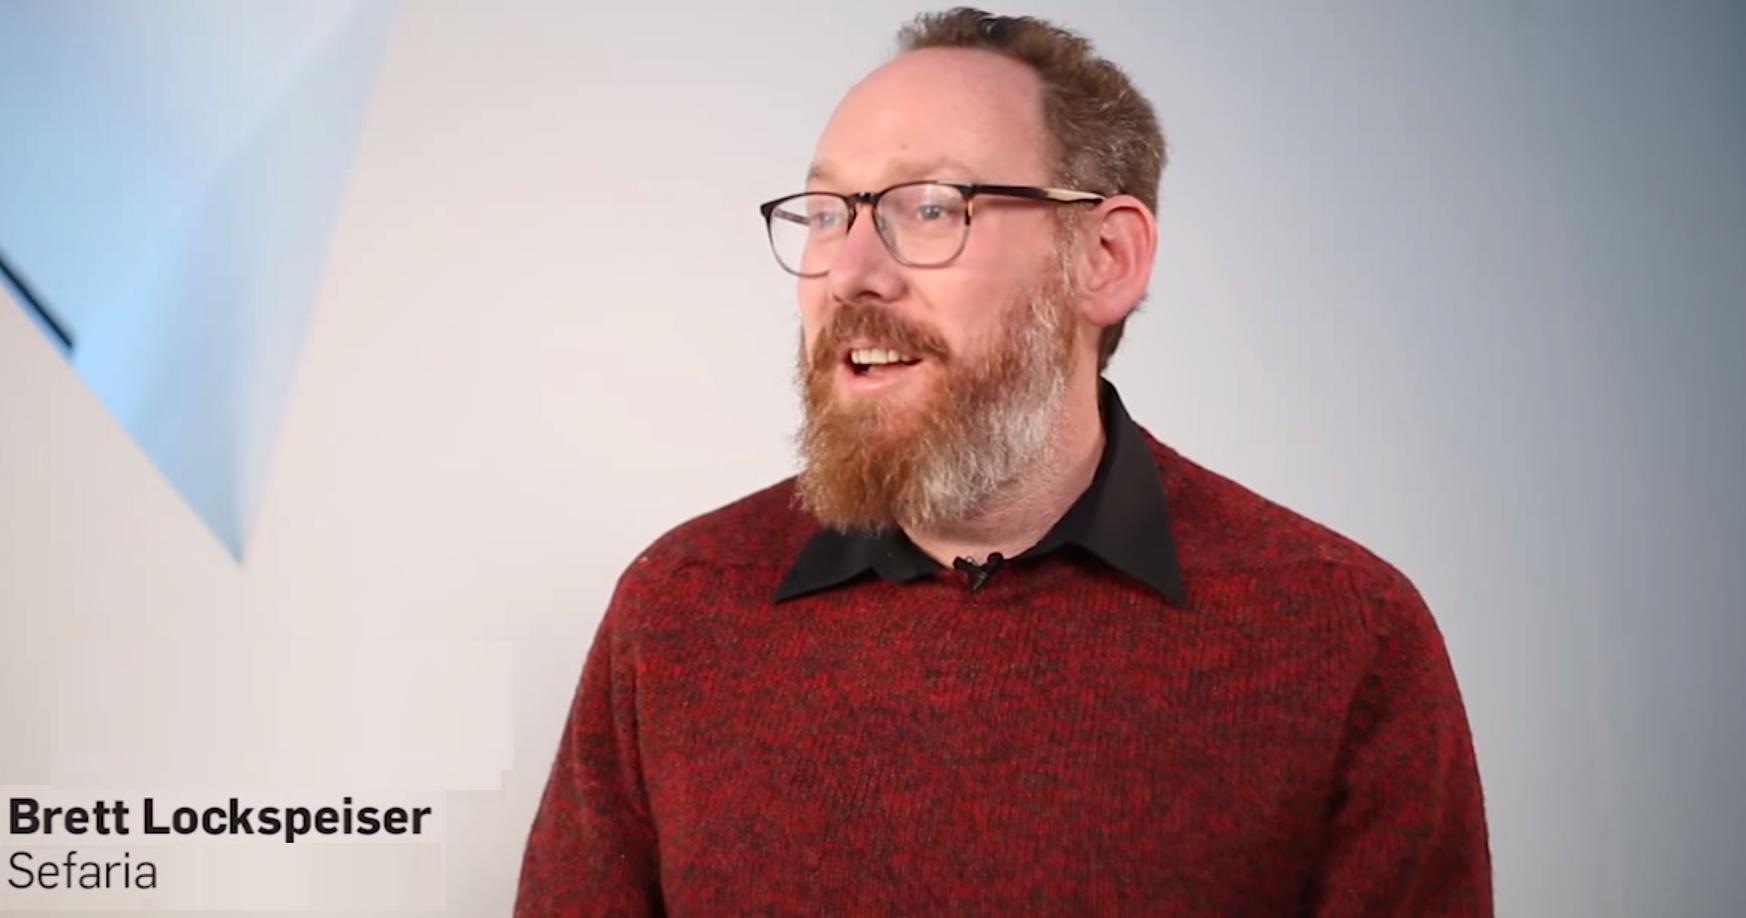 Episode 98: The Future of Torah - Brett Lockspeiser